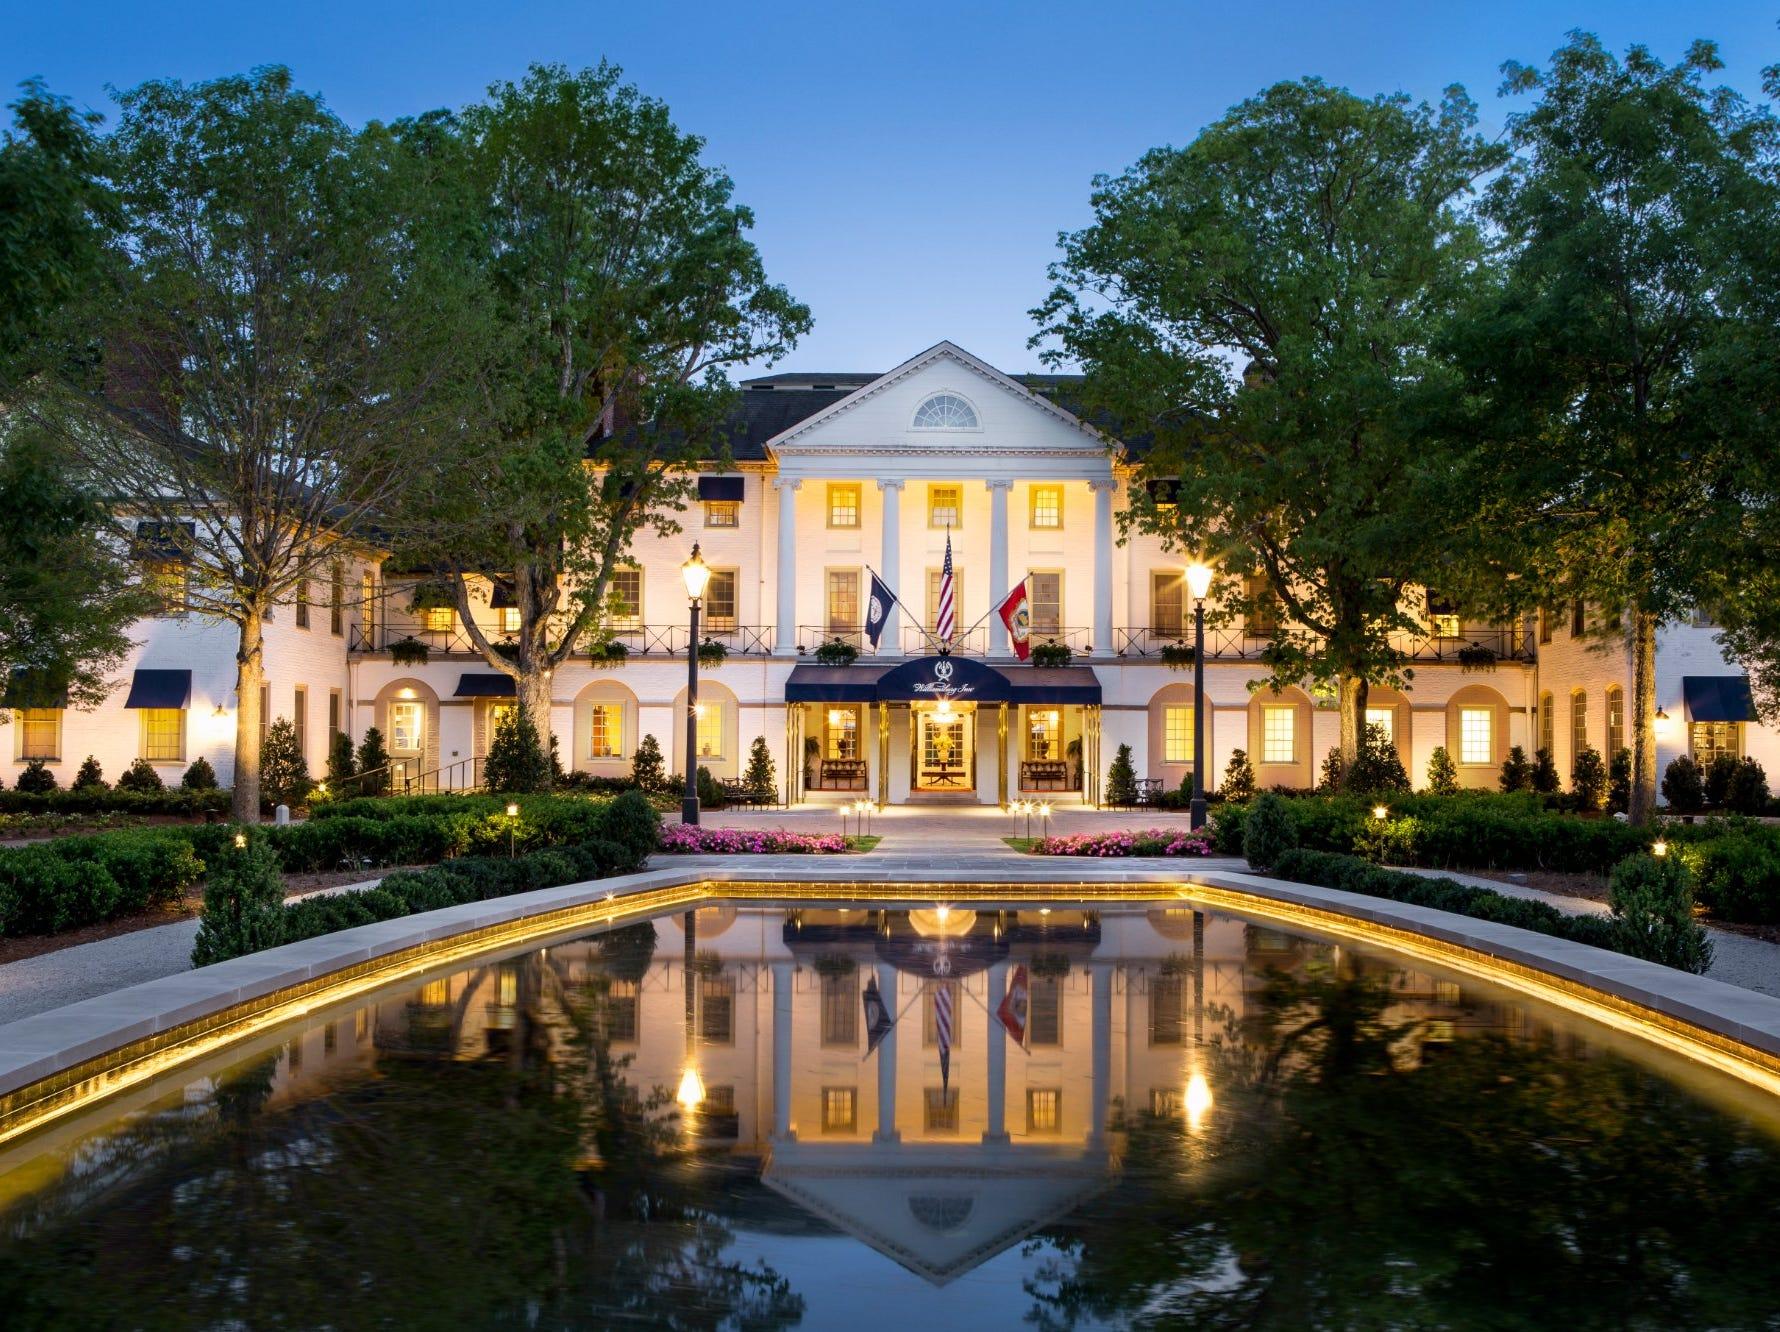 World's best hotels: TripAdvisor's 2019 award winners